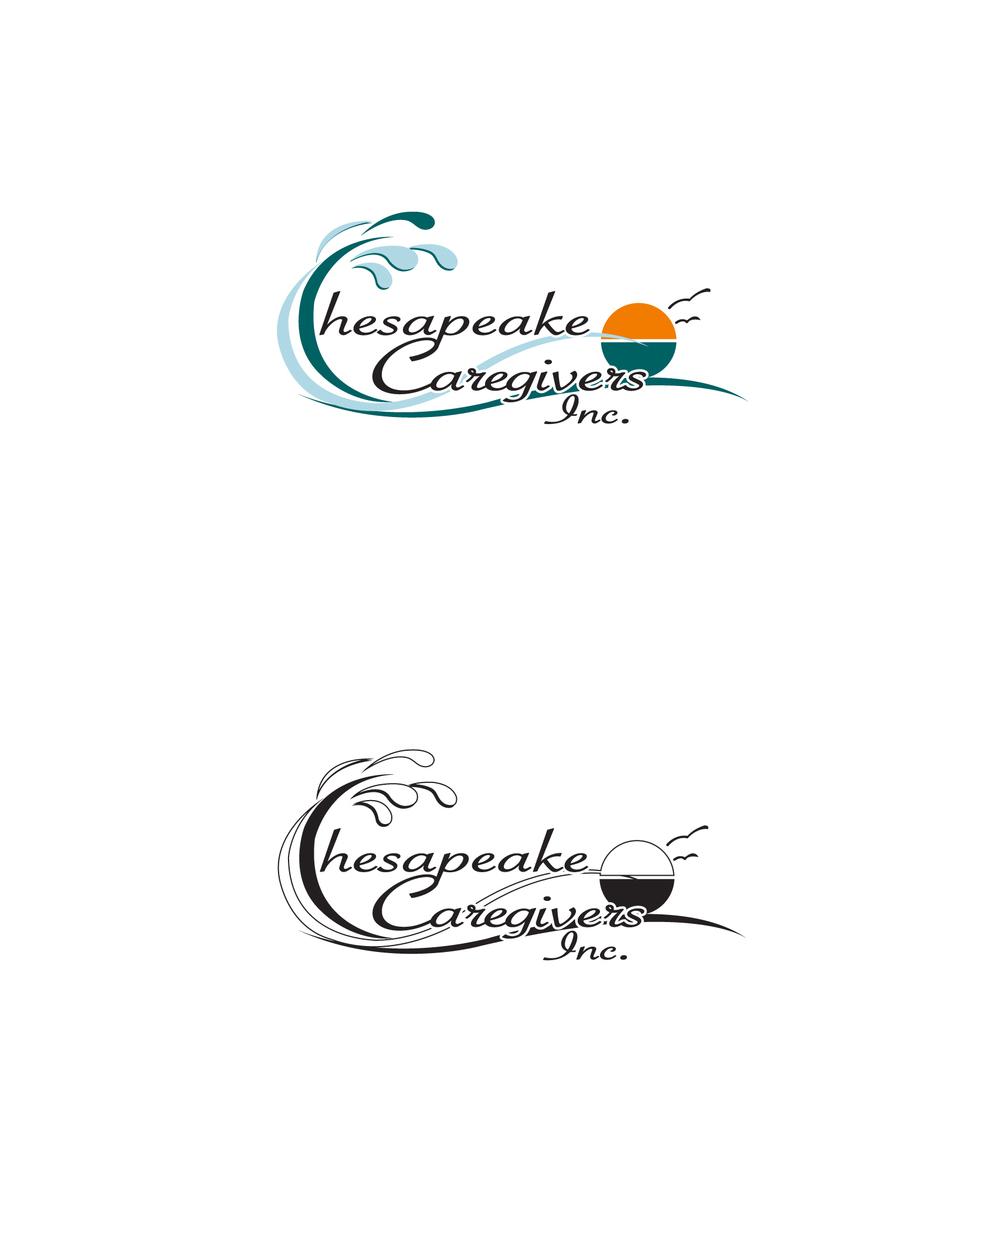 CHESAPEAKE CAREGIVERS 1.jpg